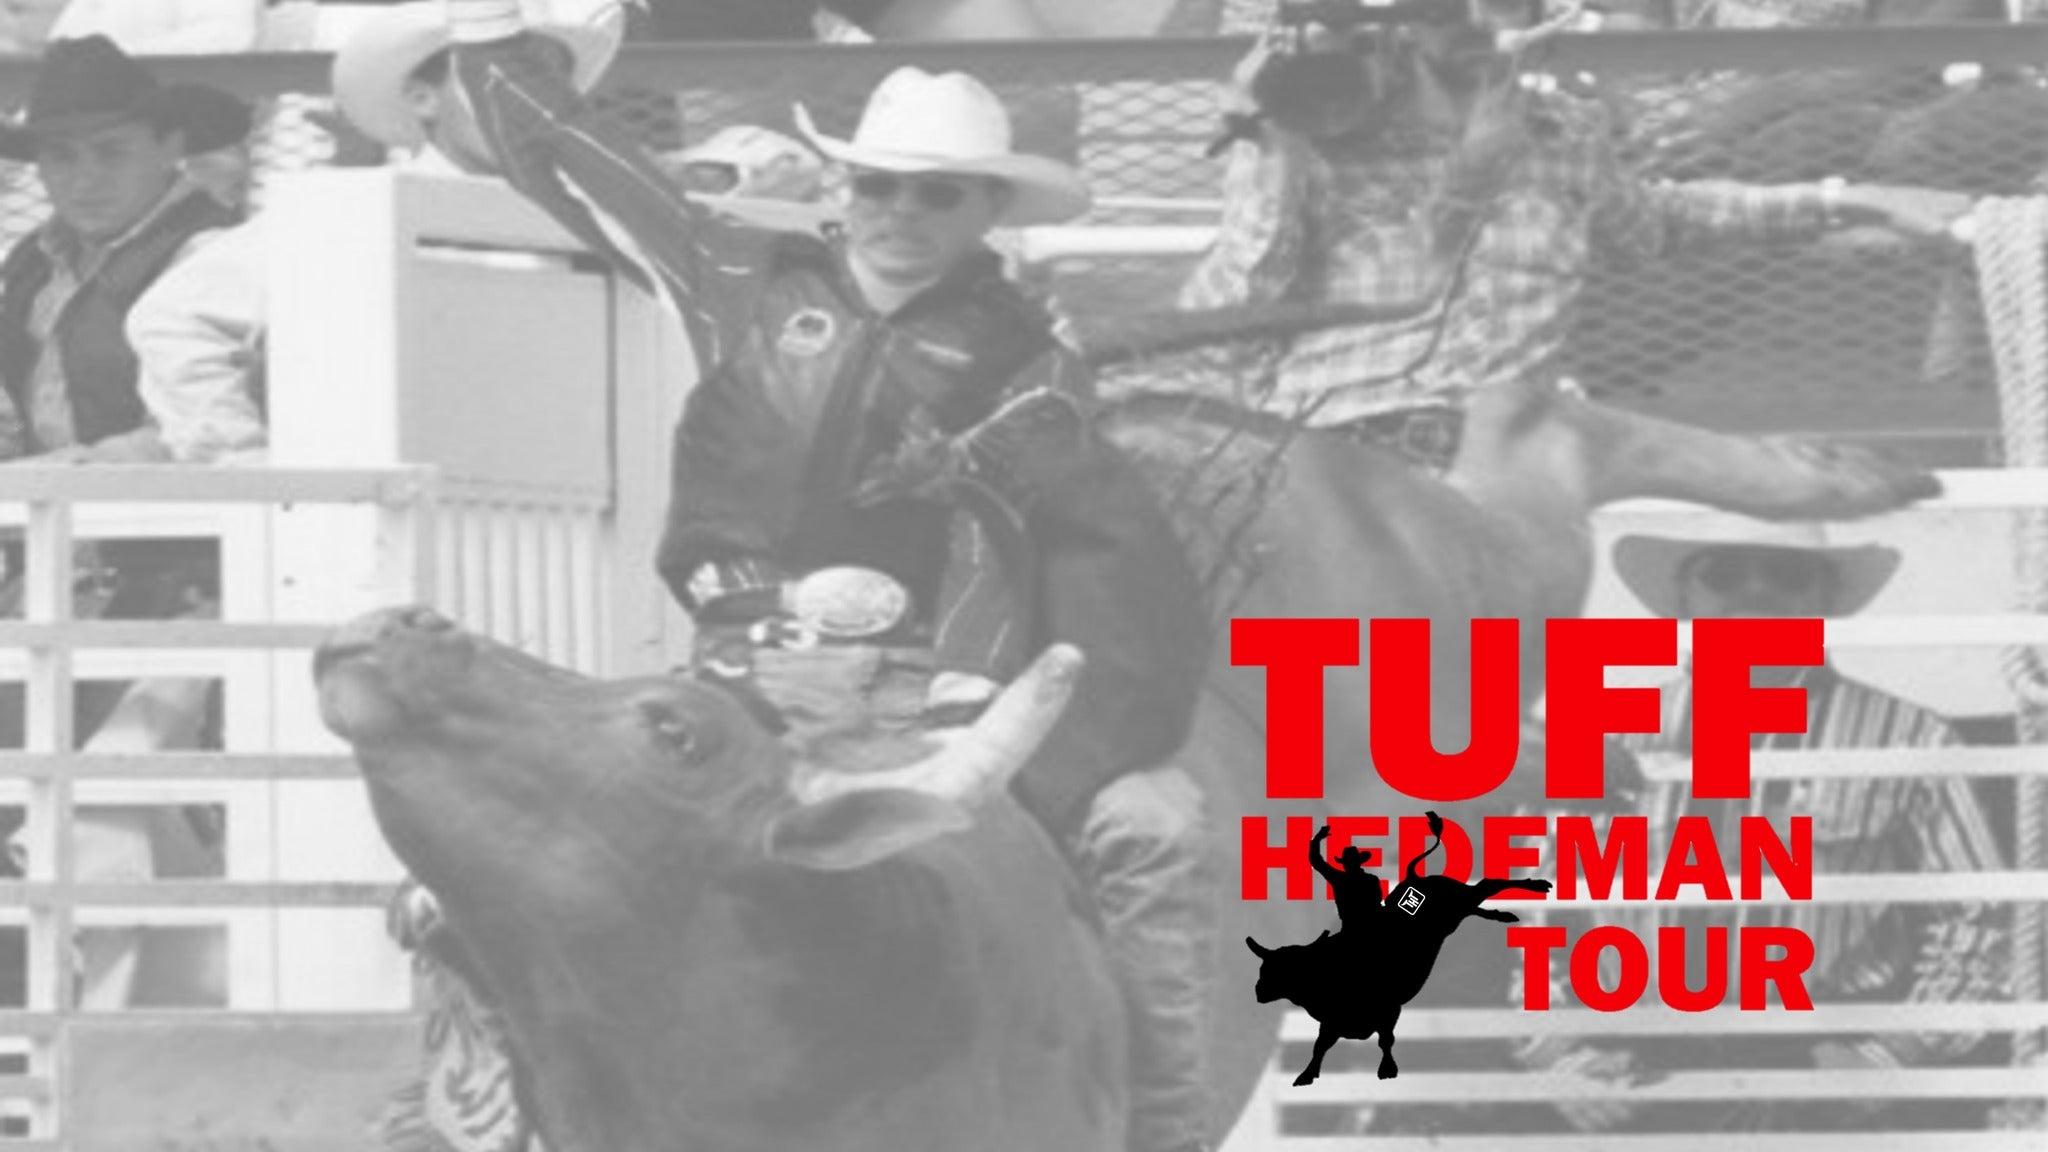 Tuff Hedeman Bull Riding at El Paso County Coliseum